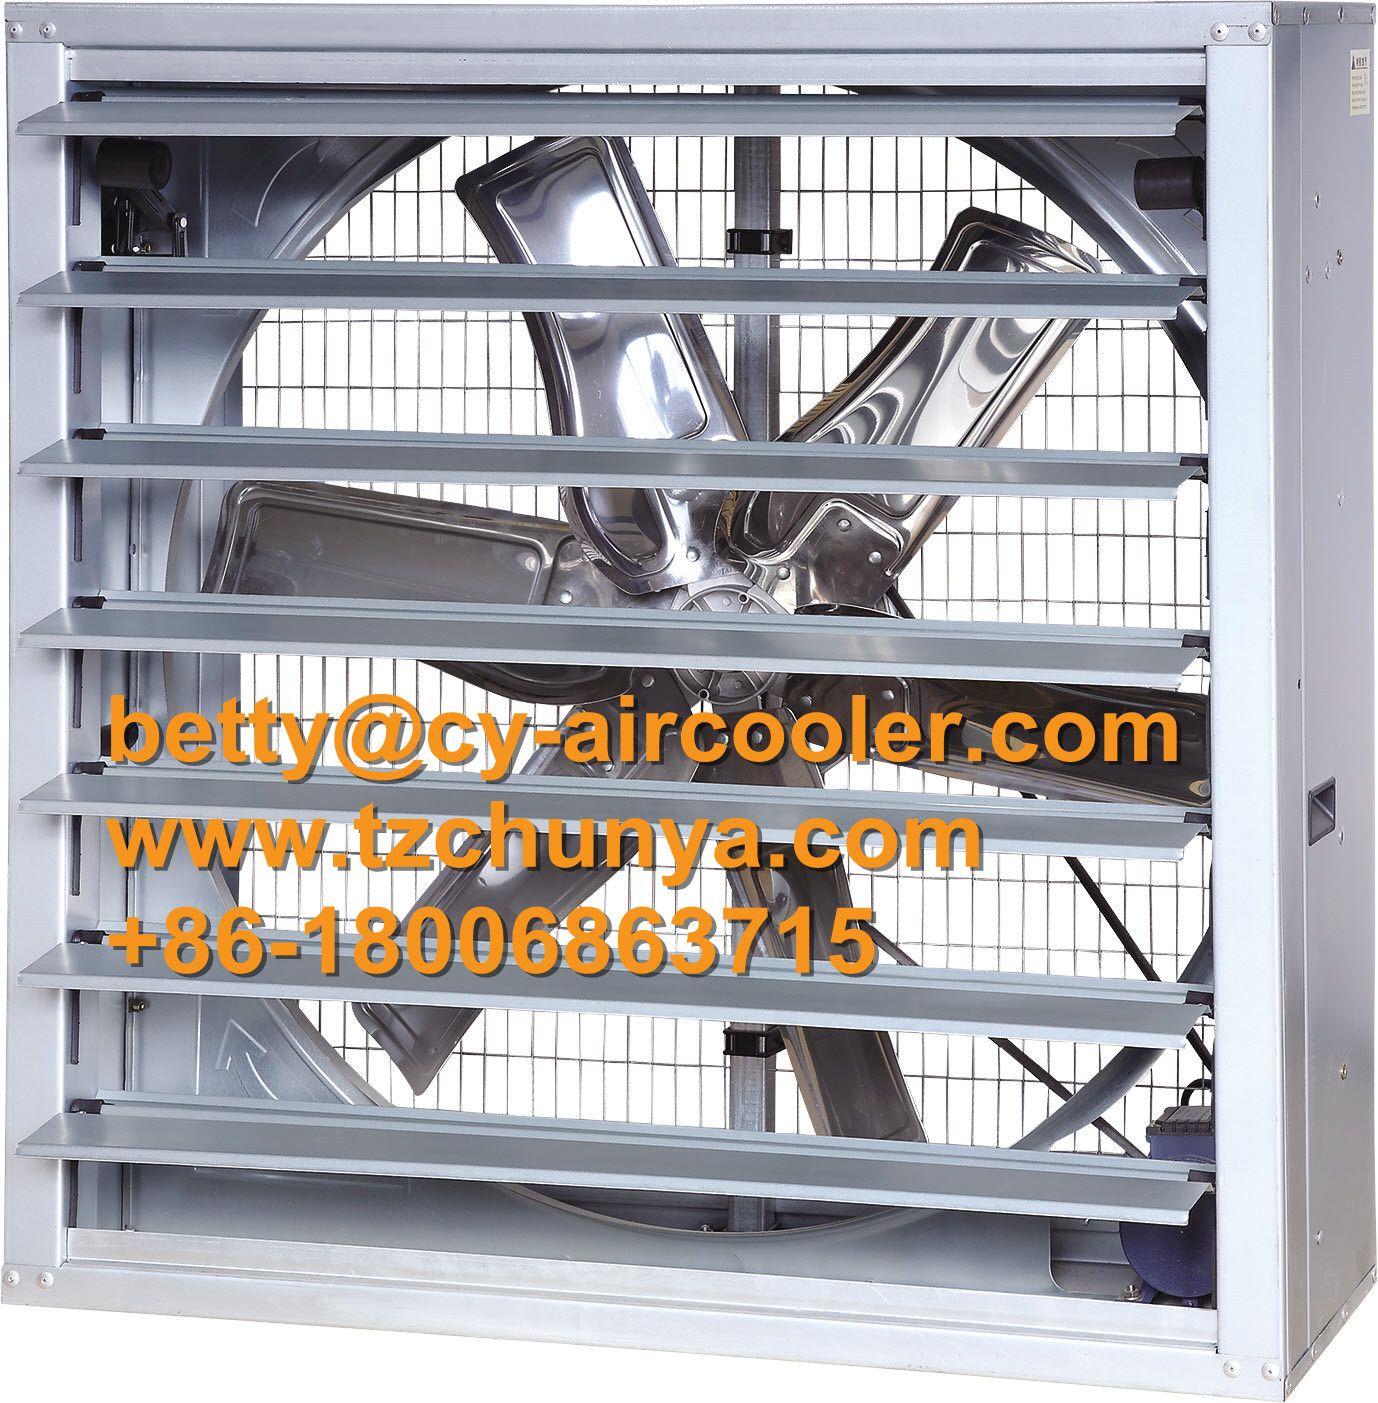 30000 CMH High Effective Large Evaporative Air Cooler